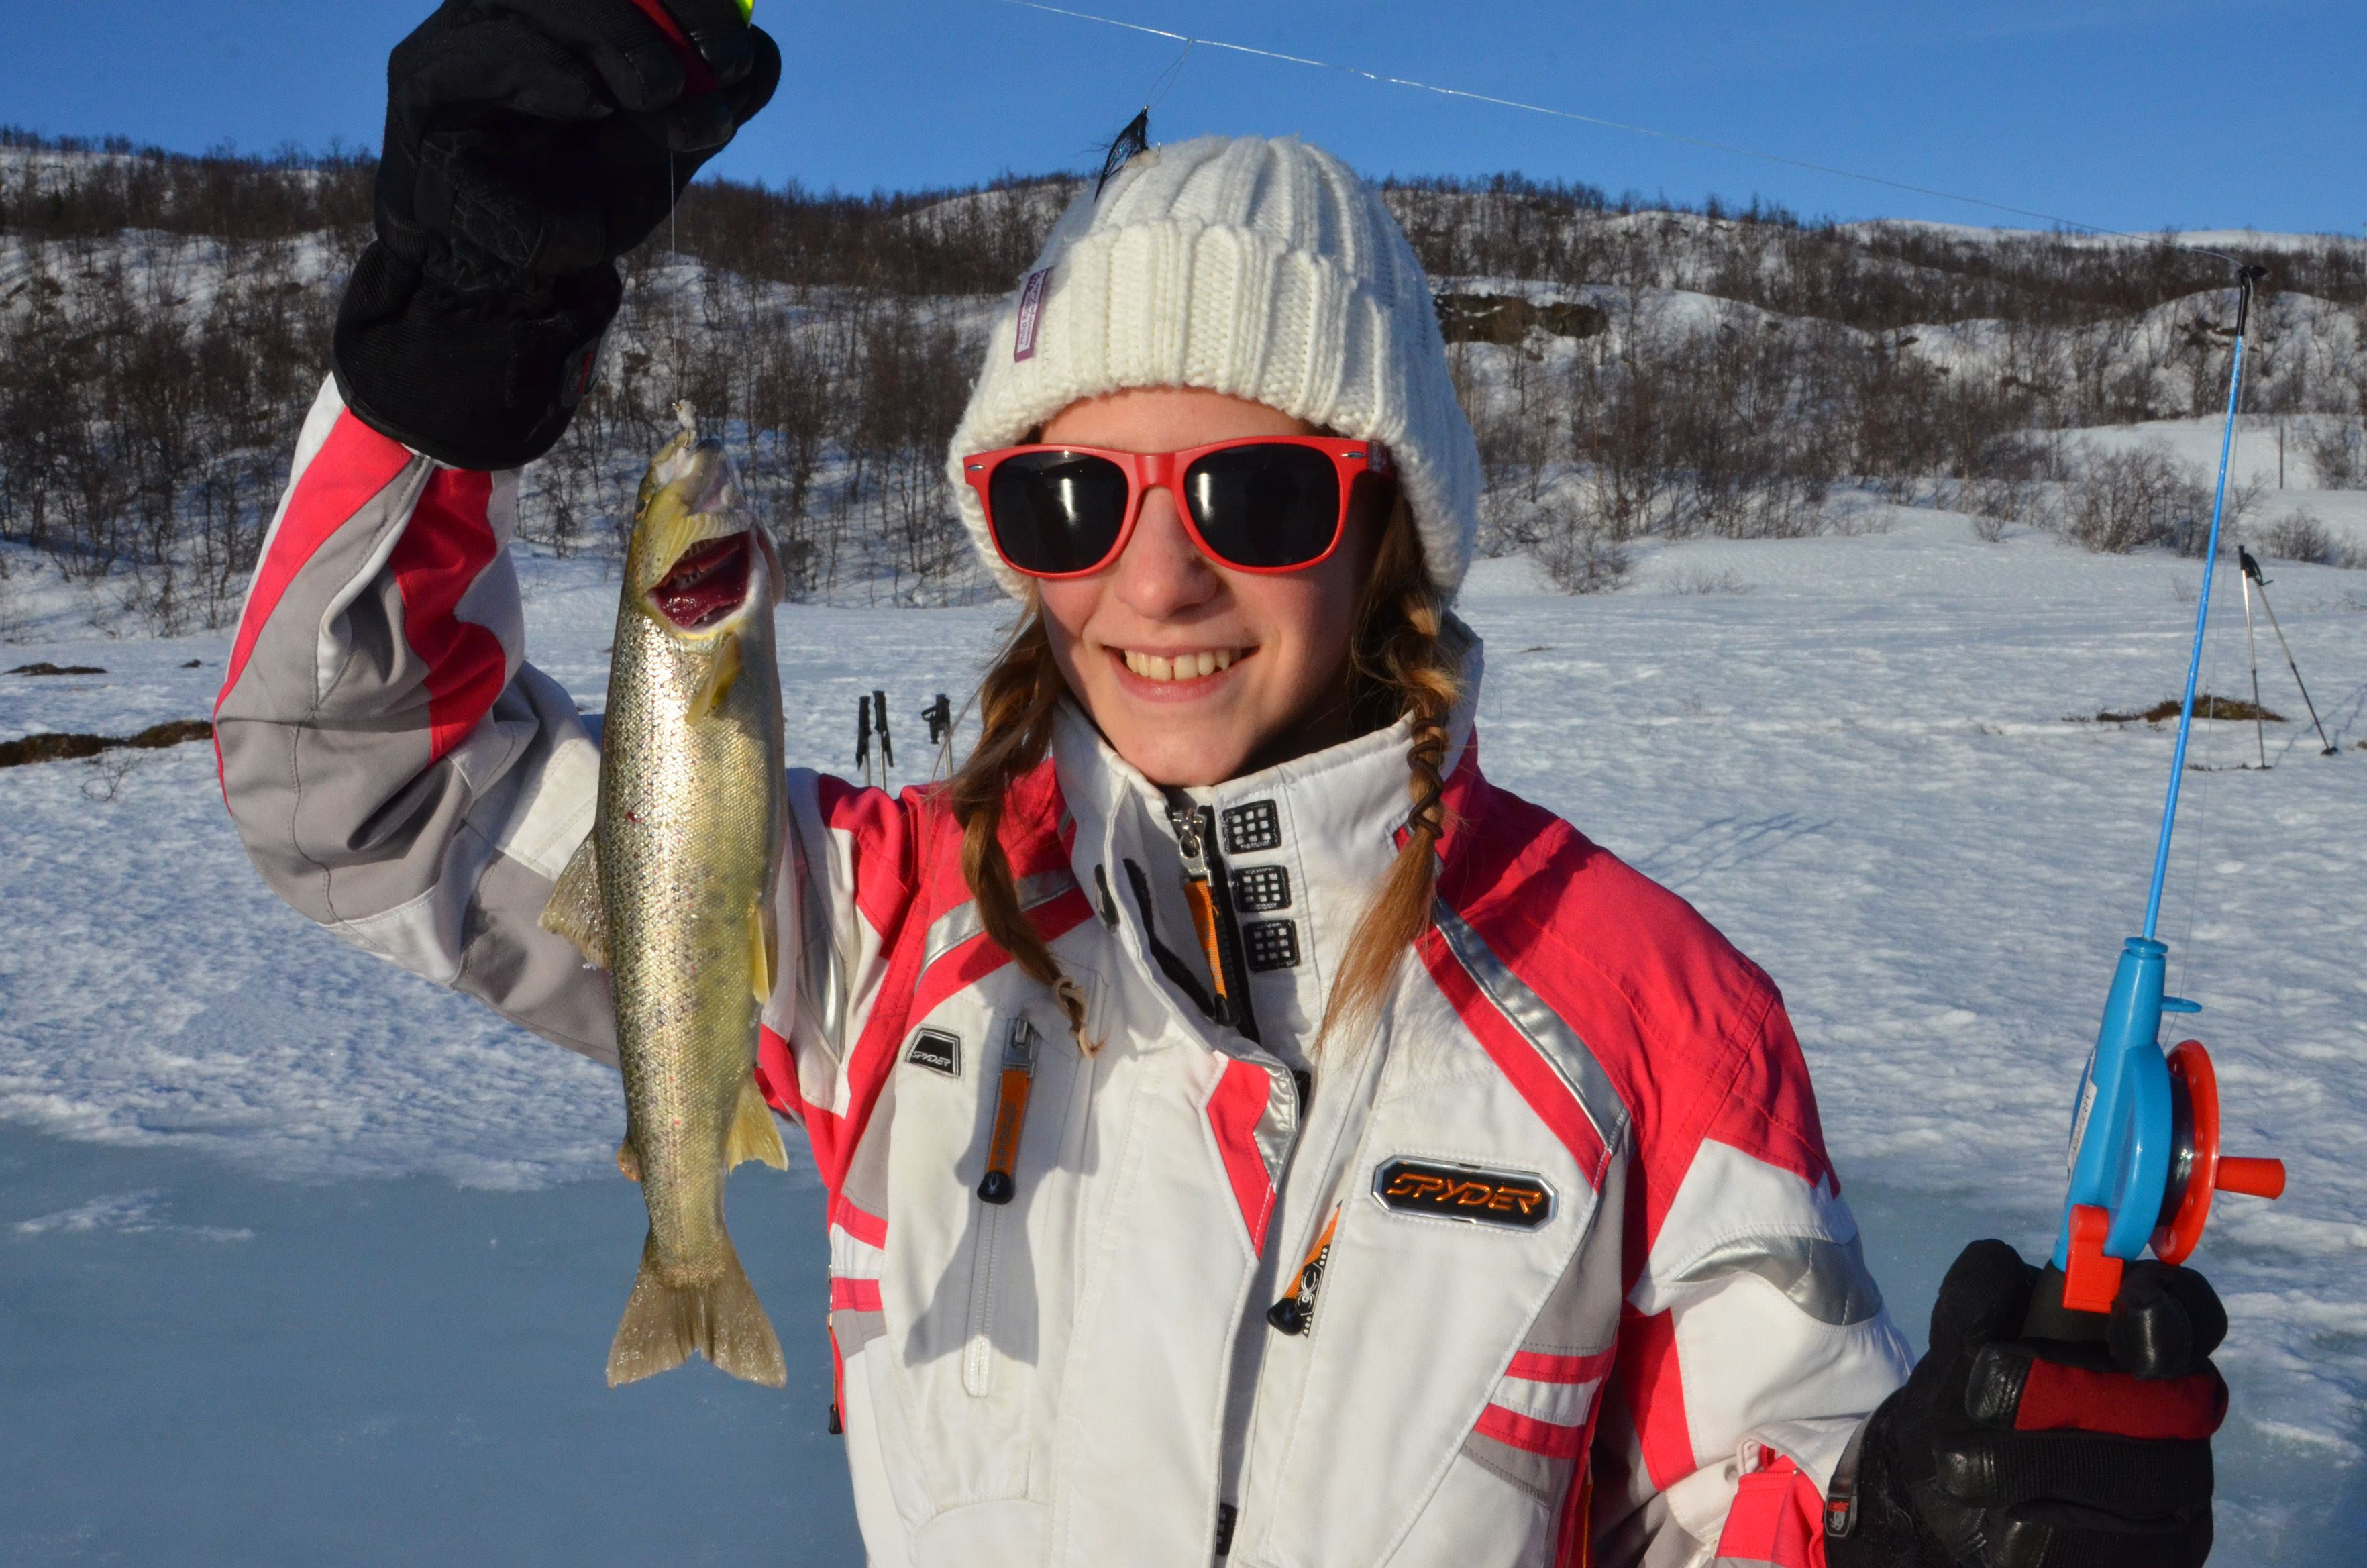 Ice Fishing & Snowshoe – GuideGunnar (from Jan 15)